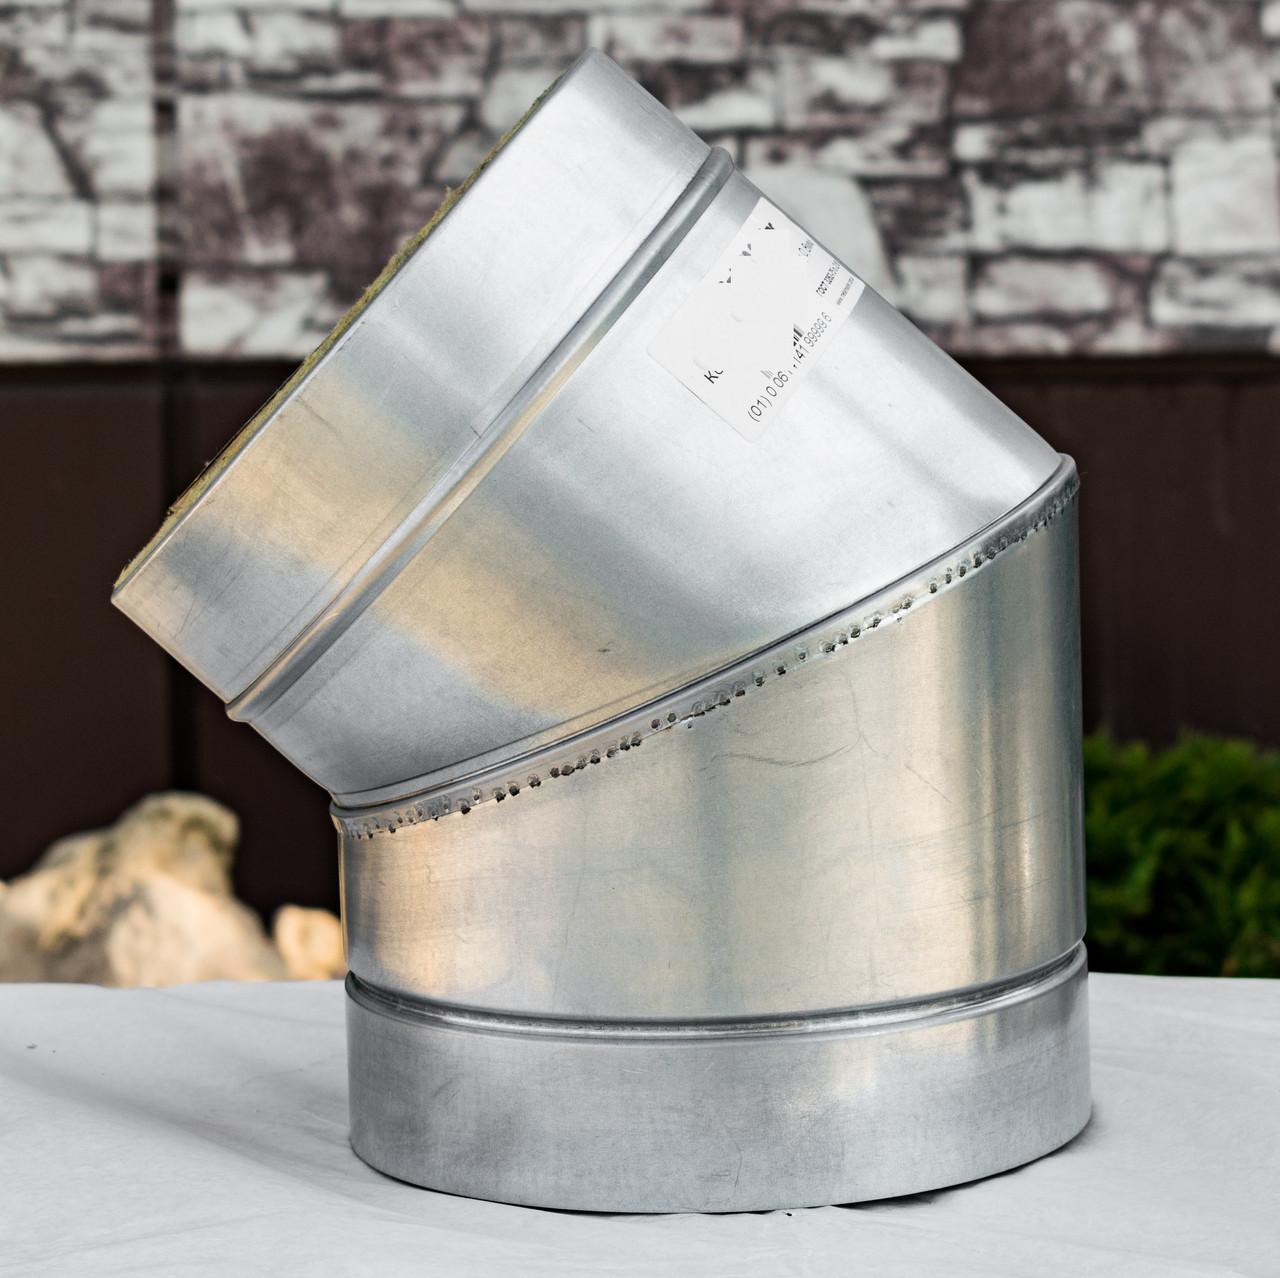 Колено дымохода 45° нерж/оц 0,5 200/260